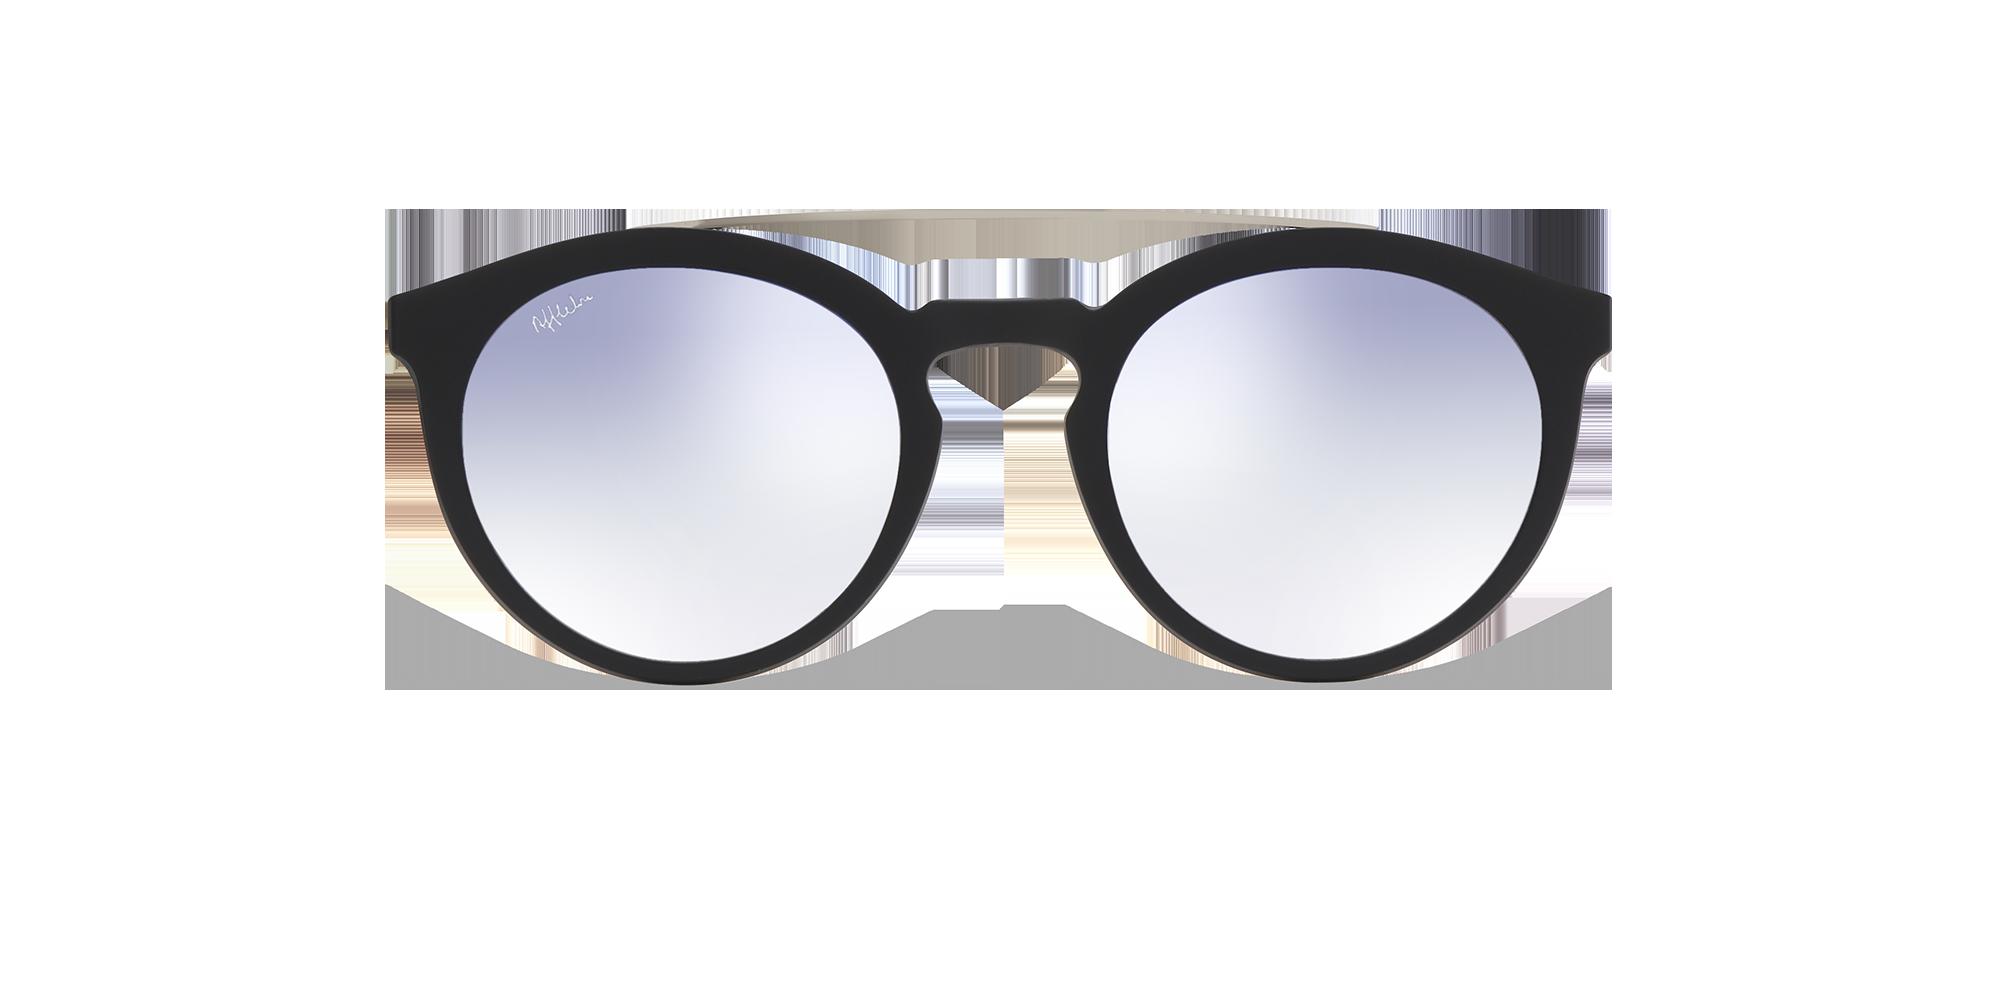 afflelou/france/products/smart_clip/clips_glasses/TMK35TBBK014820.png